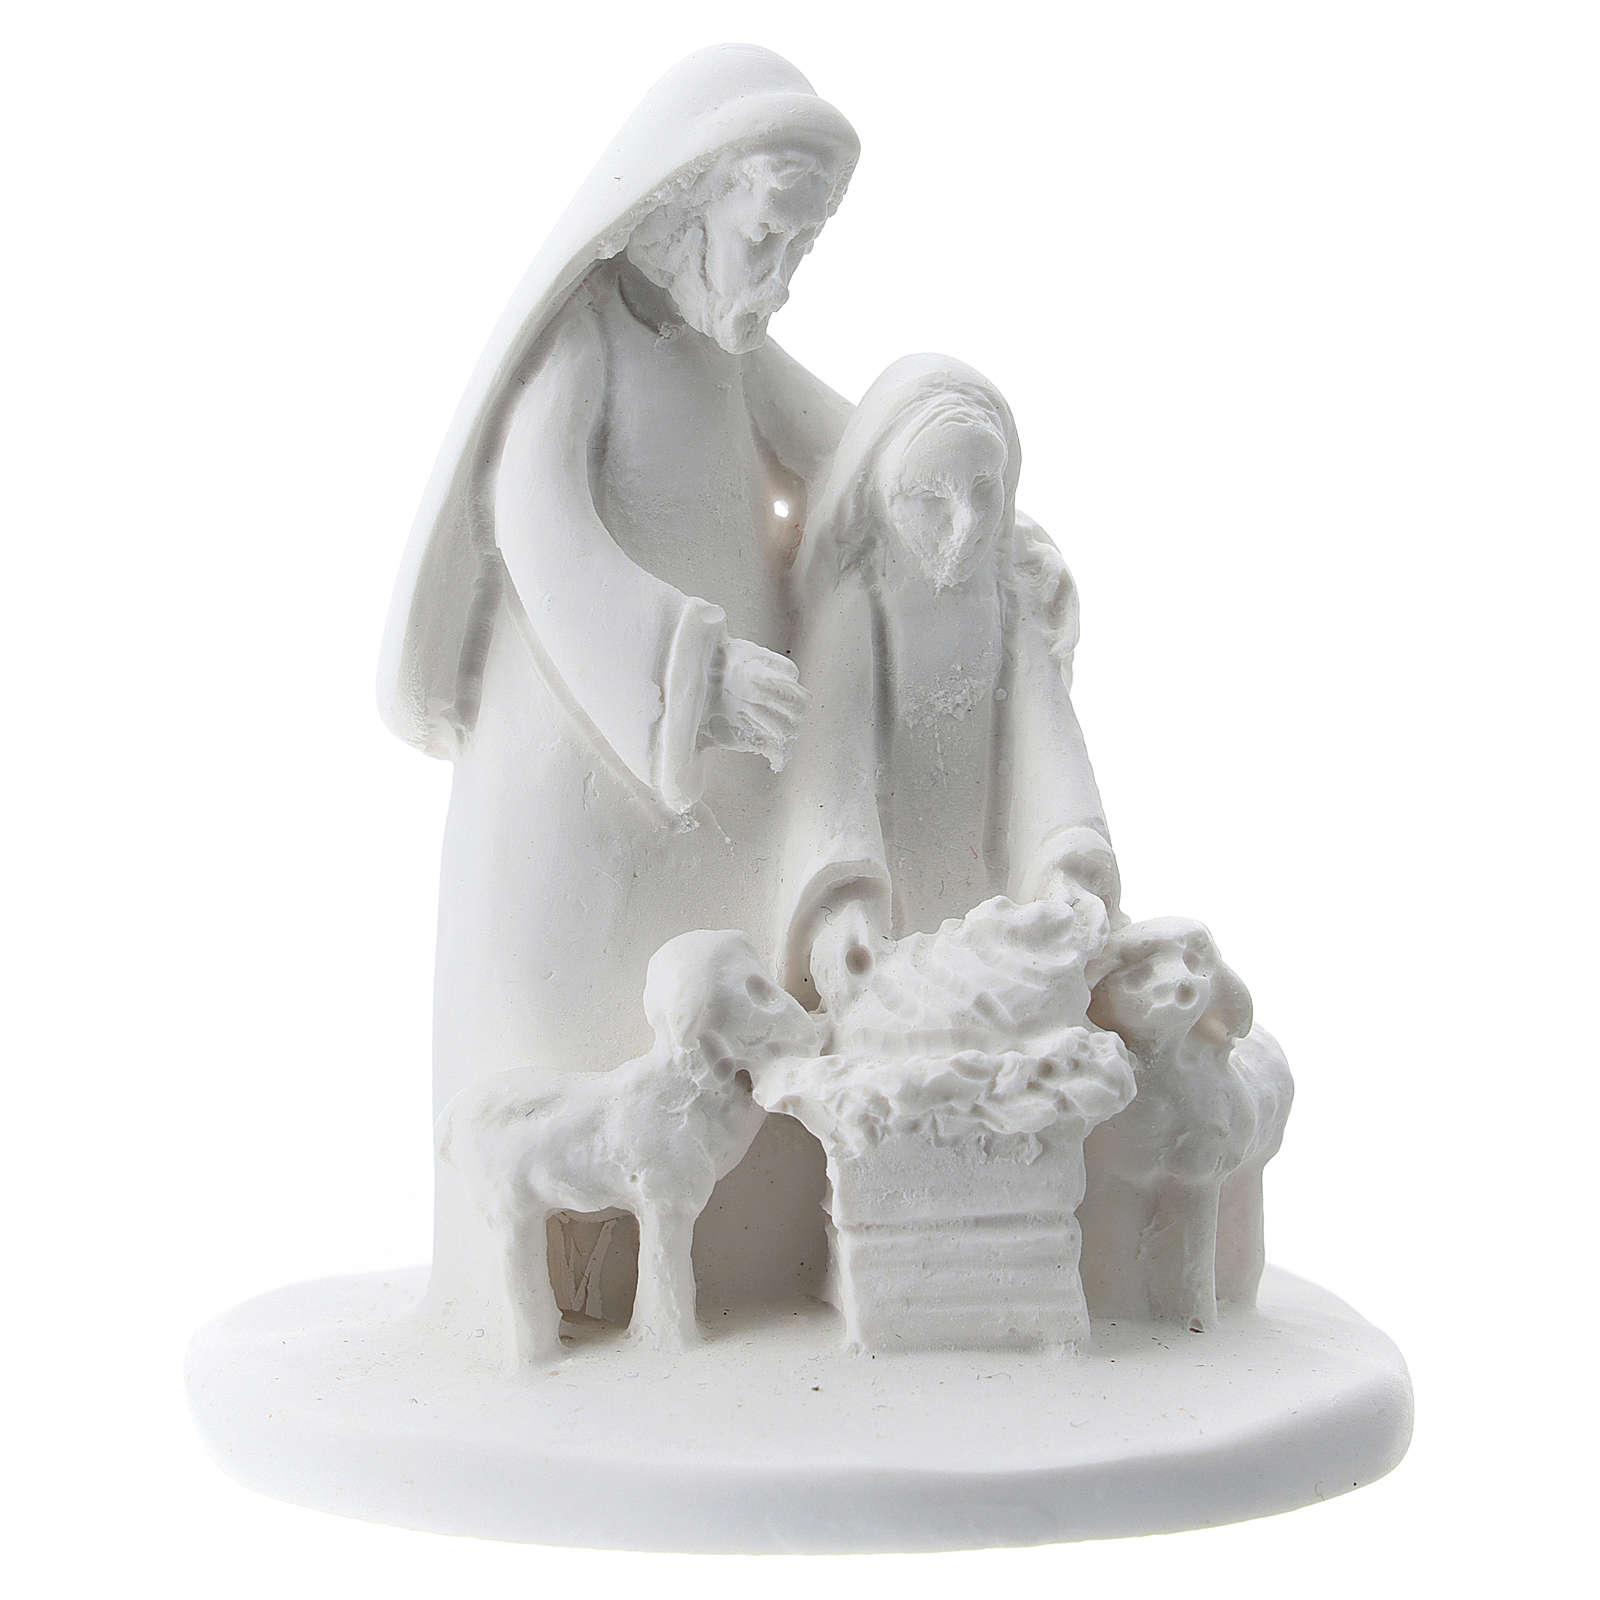 Estatua madre e hijo resina blanca 5 cm 3